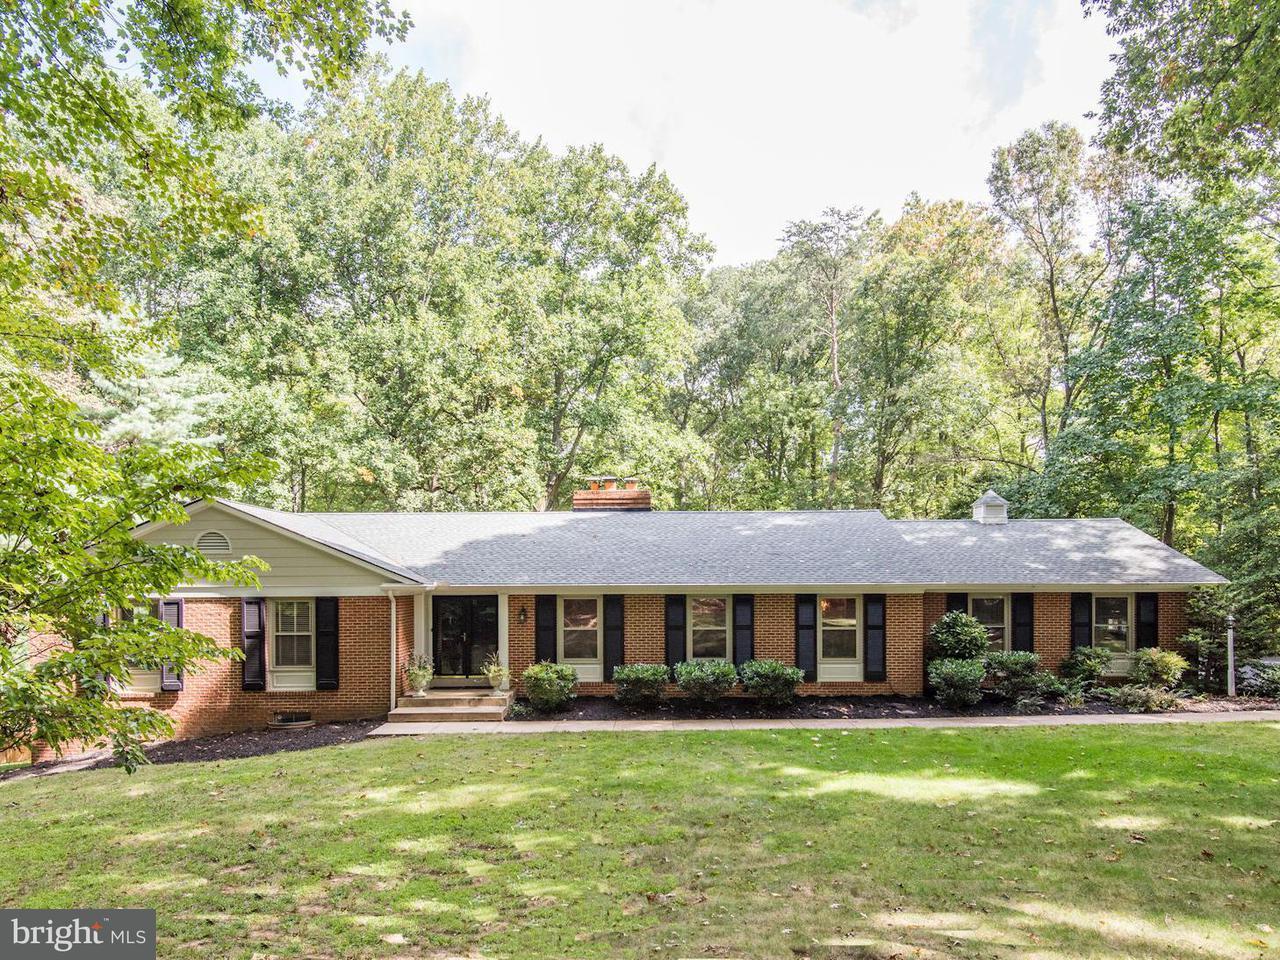 Single Family Home for Sale at 11210 LAPHAM Drive 11210 LAPHAM Drive Oakton, Virginia 22124 United States